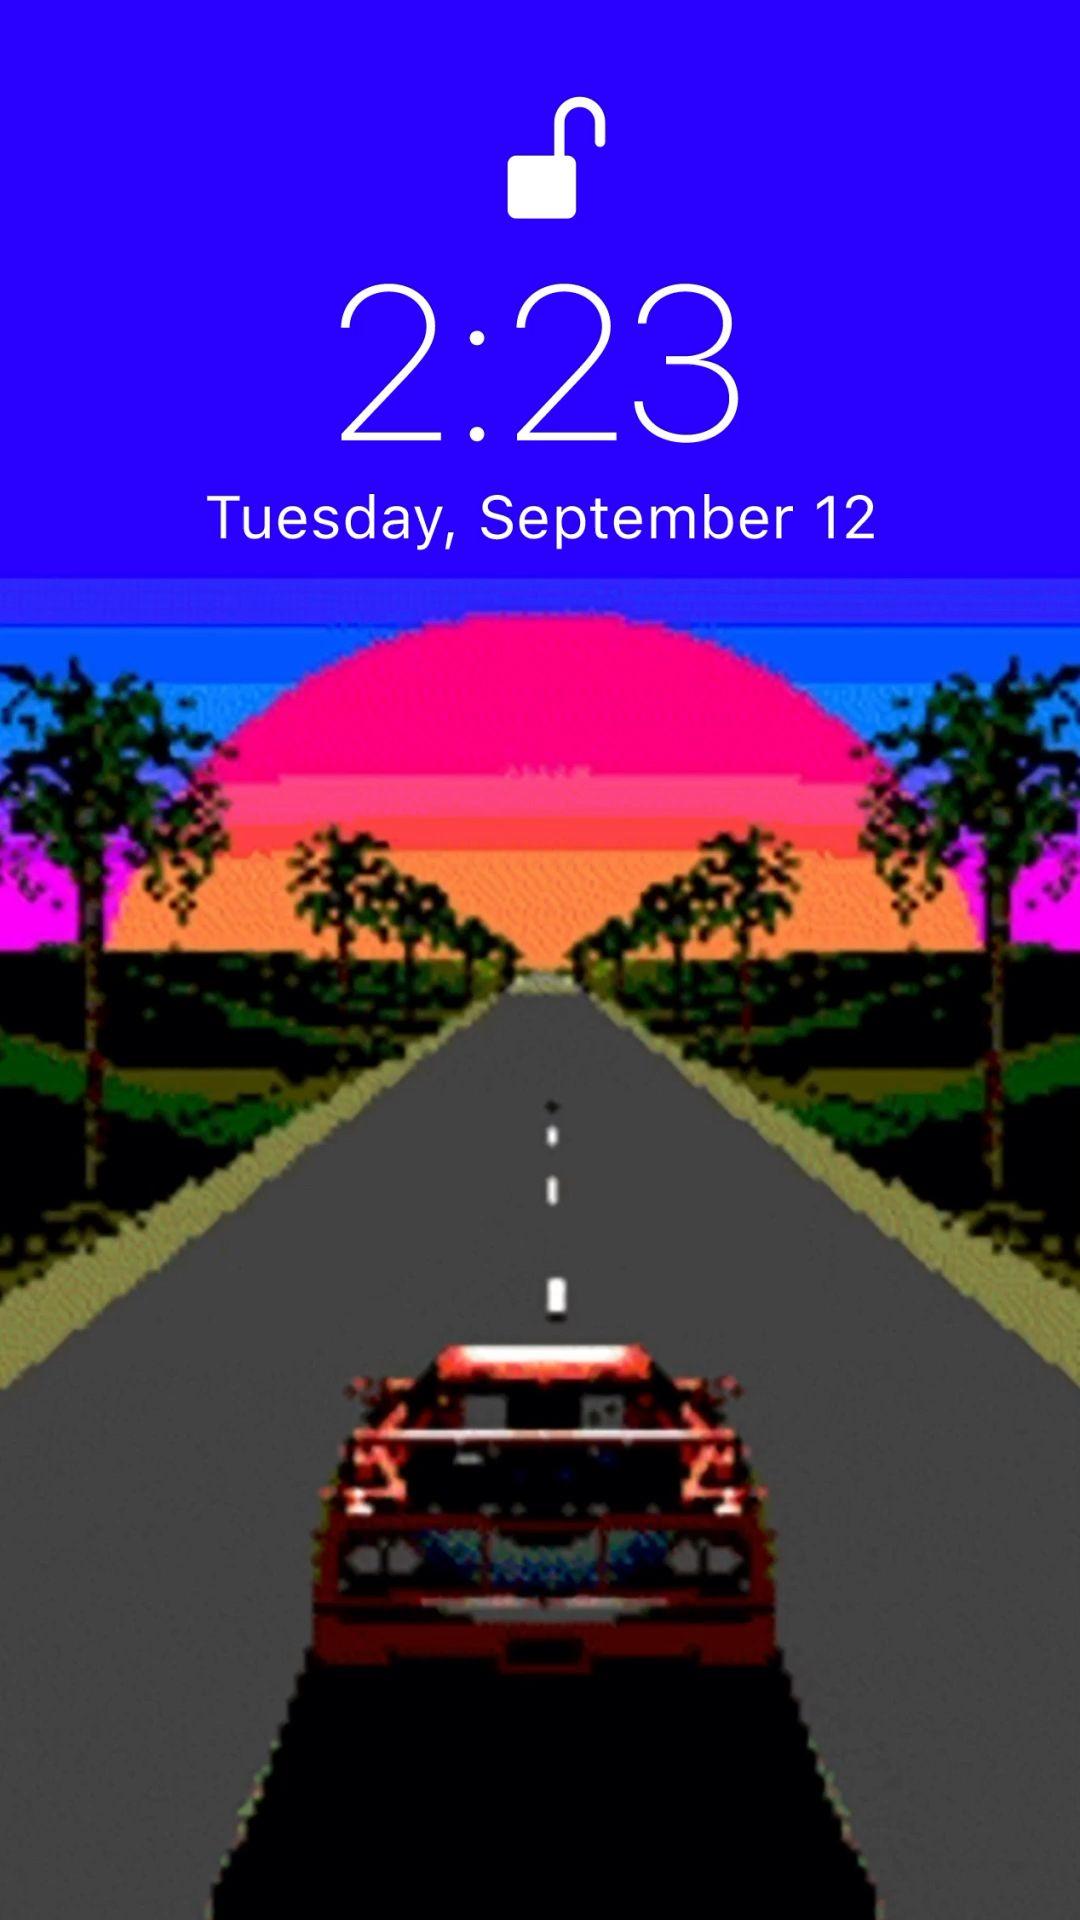 Pixel Art Wallpaper Video Iphone Wallpaper Video Iphone Wallpaper Live Wallpaper Iphone